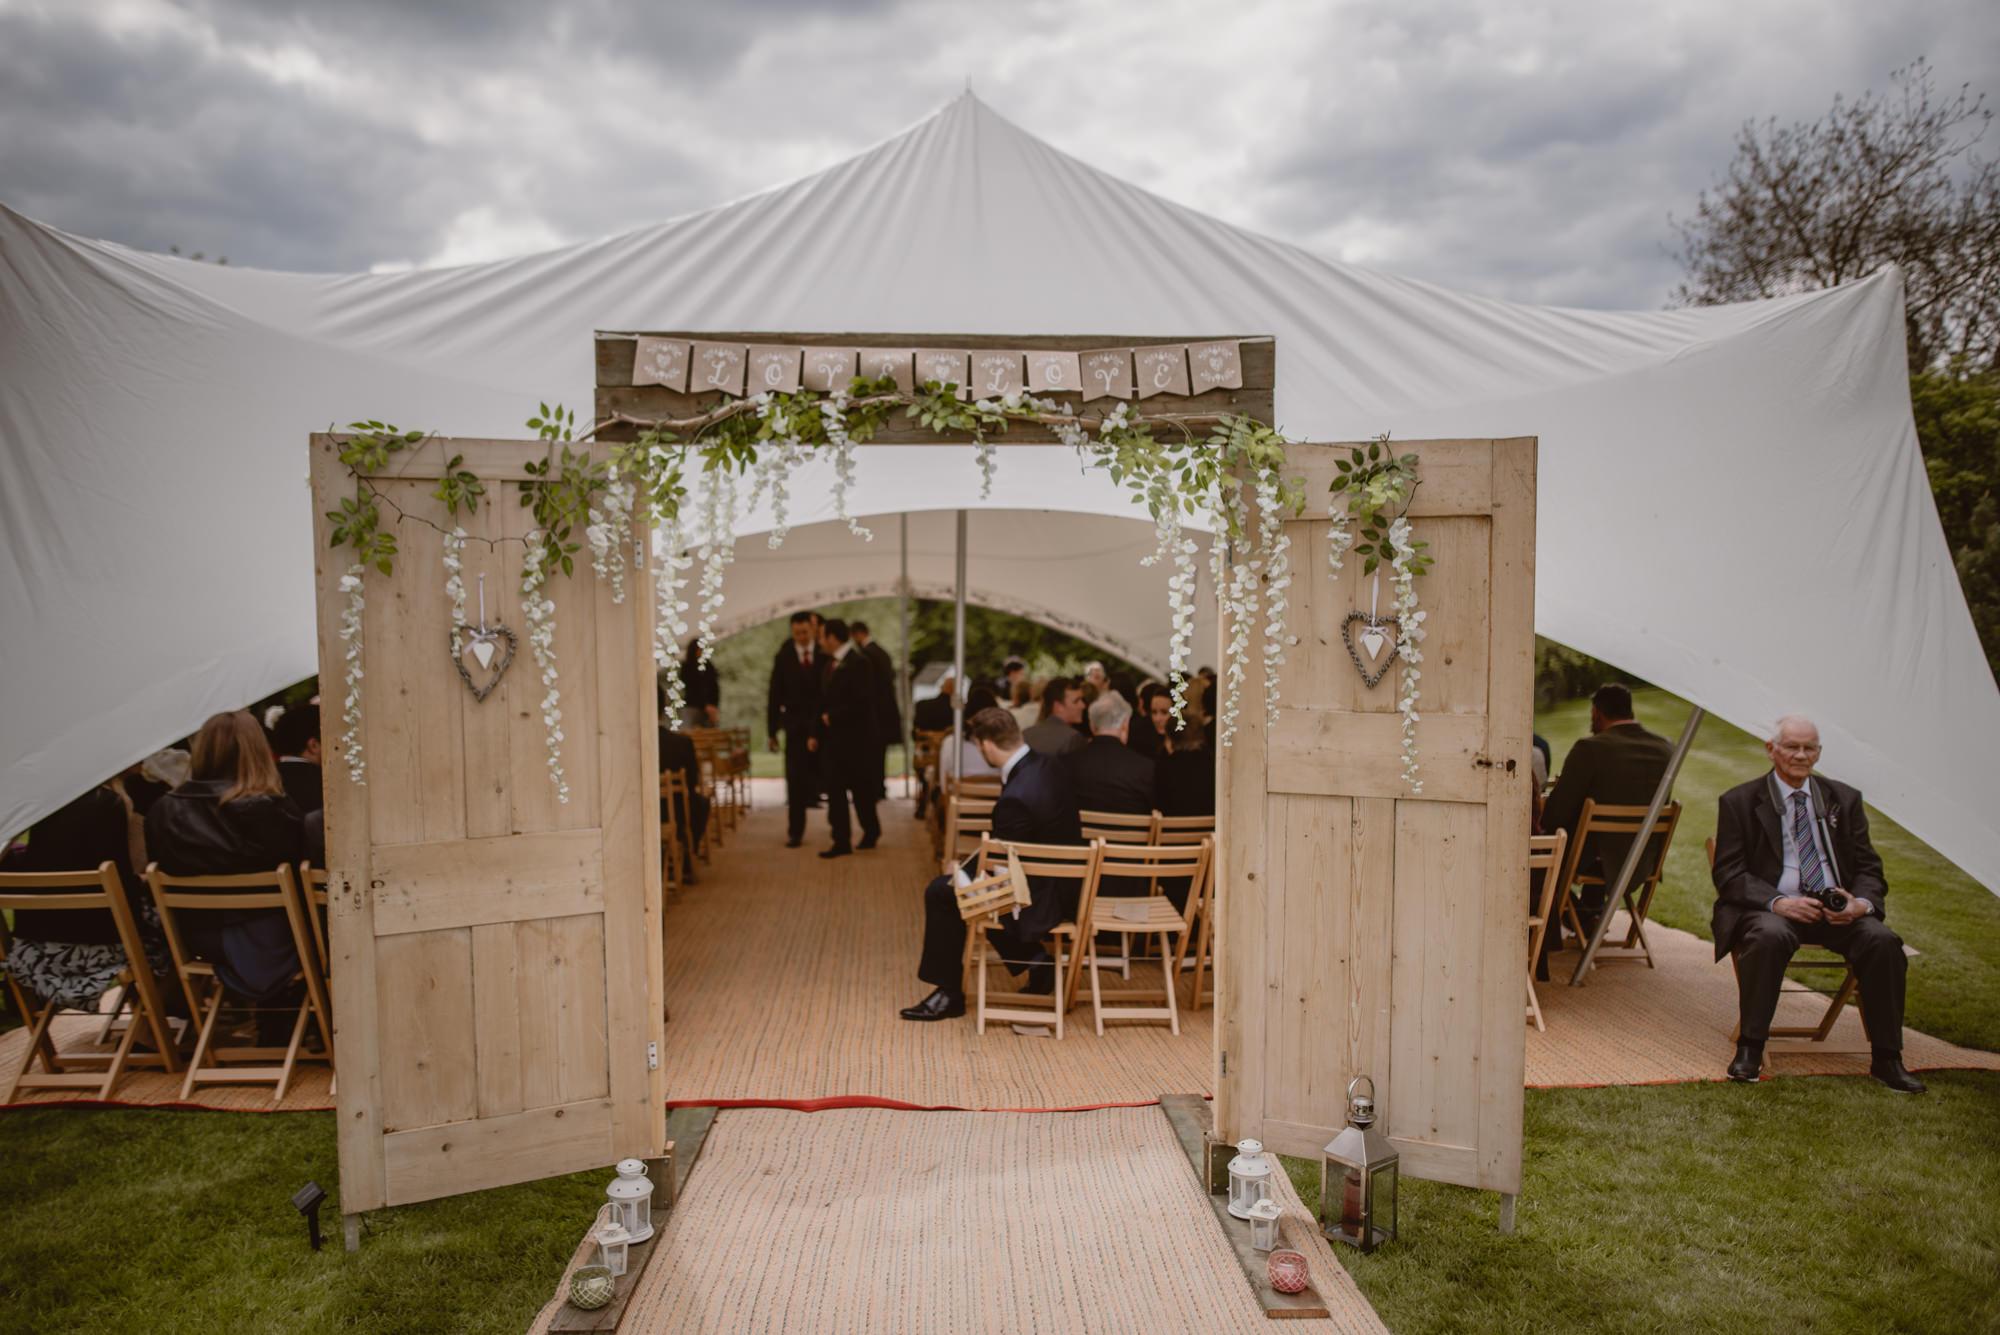 Jacqueline-Gareth-Wedding-Westmead-Events-Surrey-Manu-Mendoza-Wedding-Photography-147.jpg